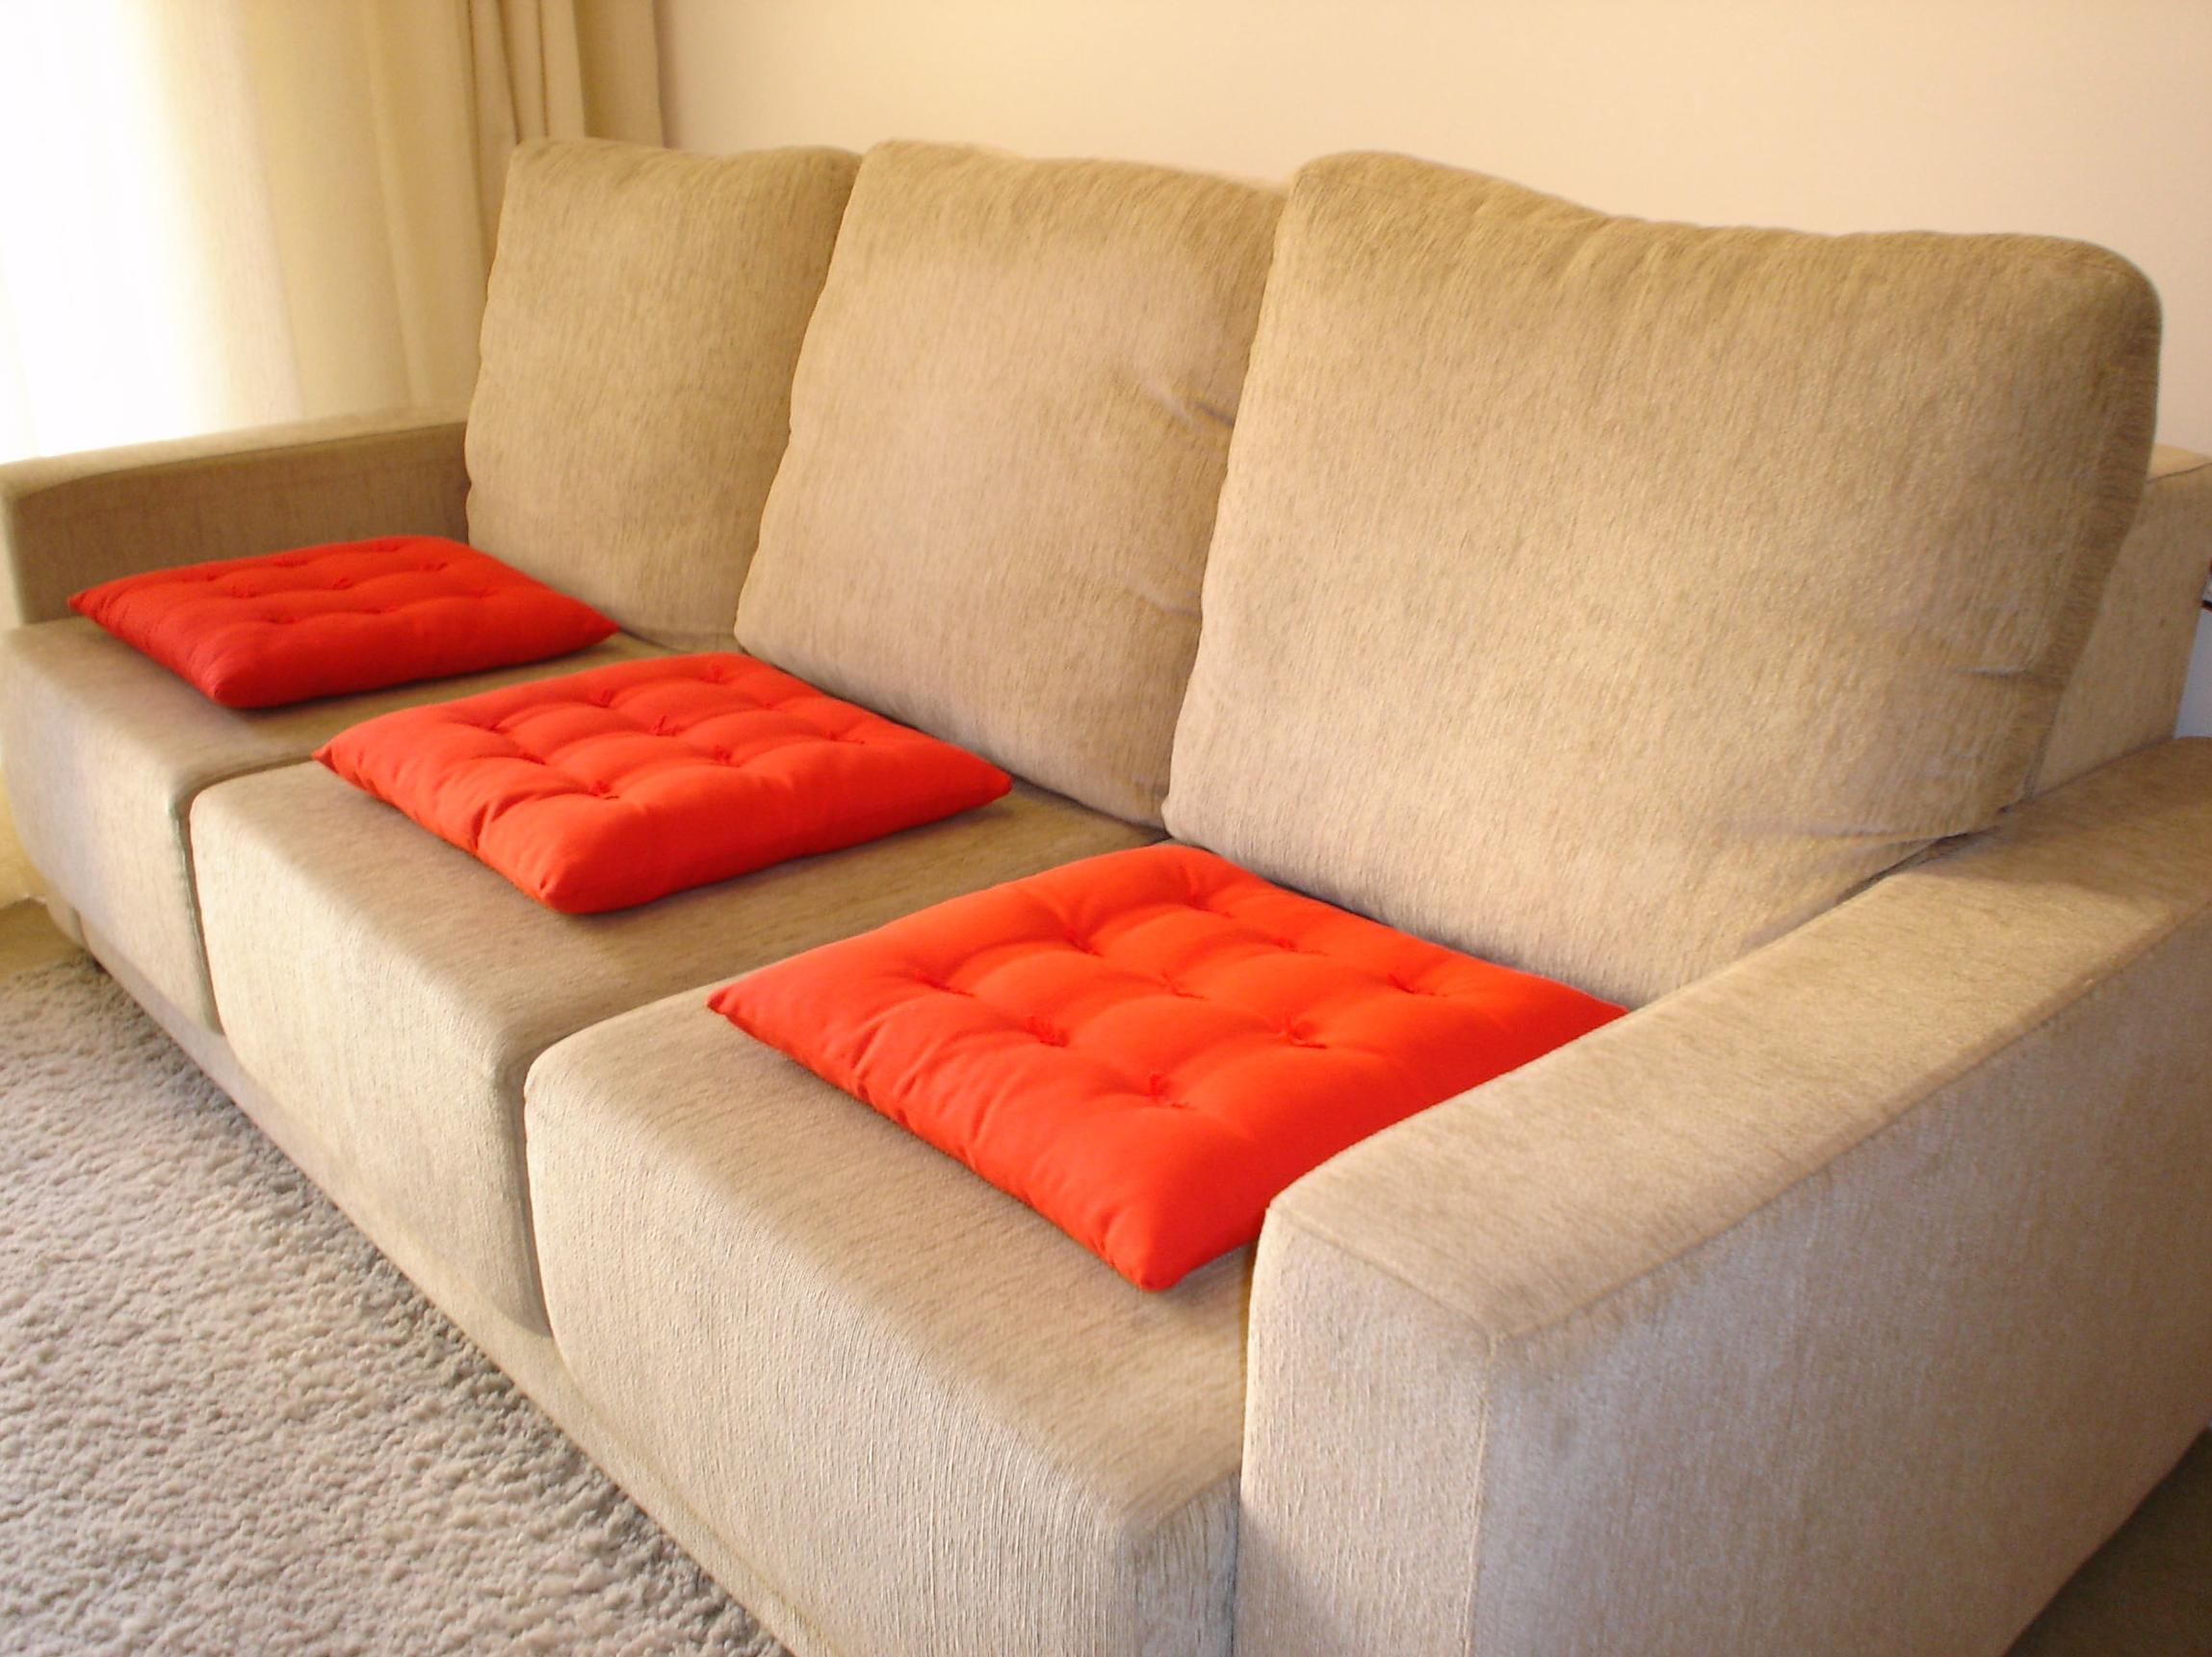 Recogida de muebles en Pamplona